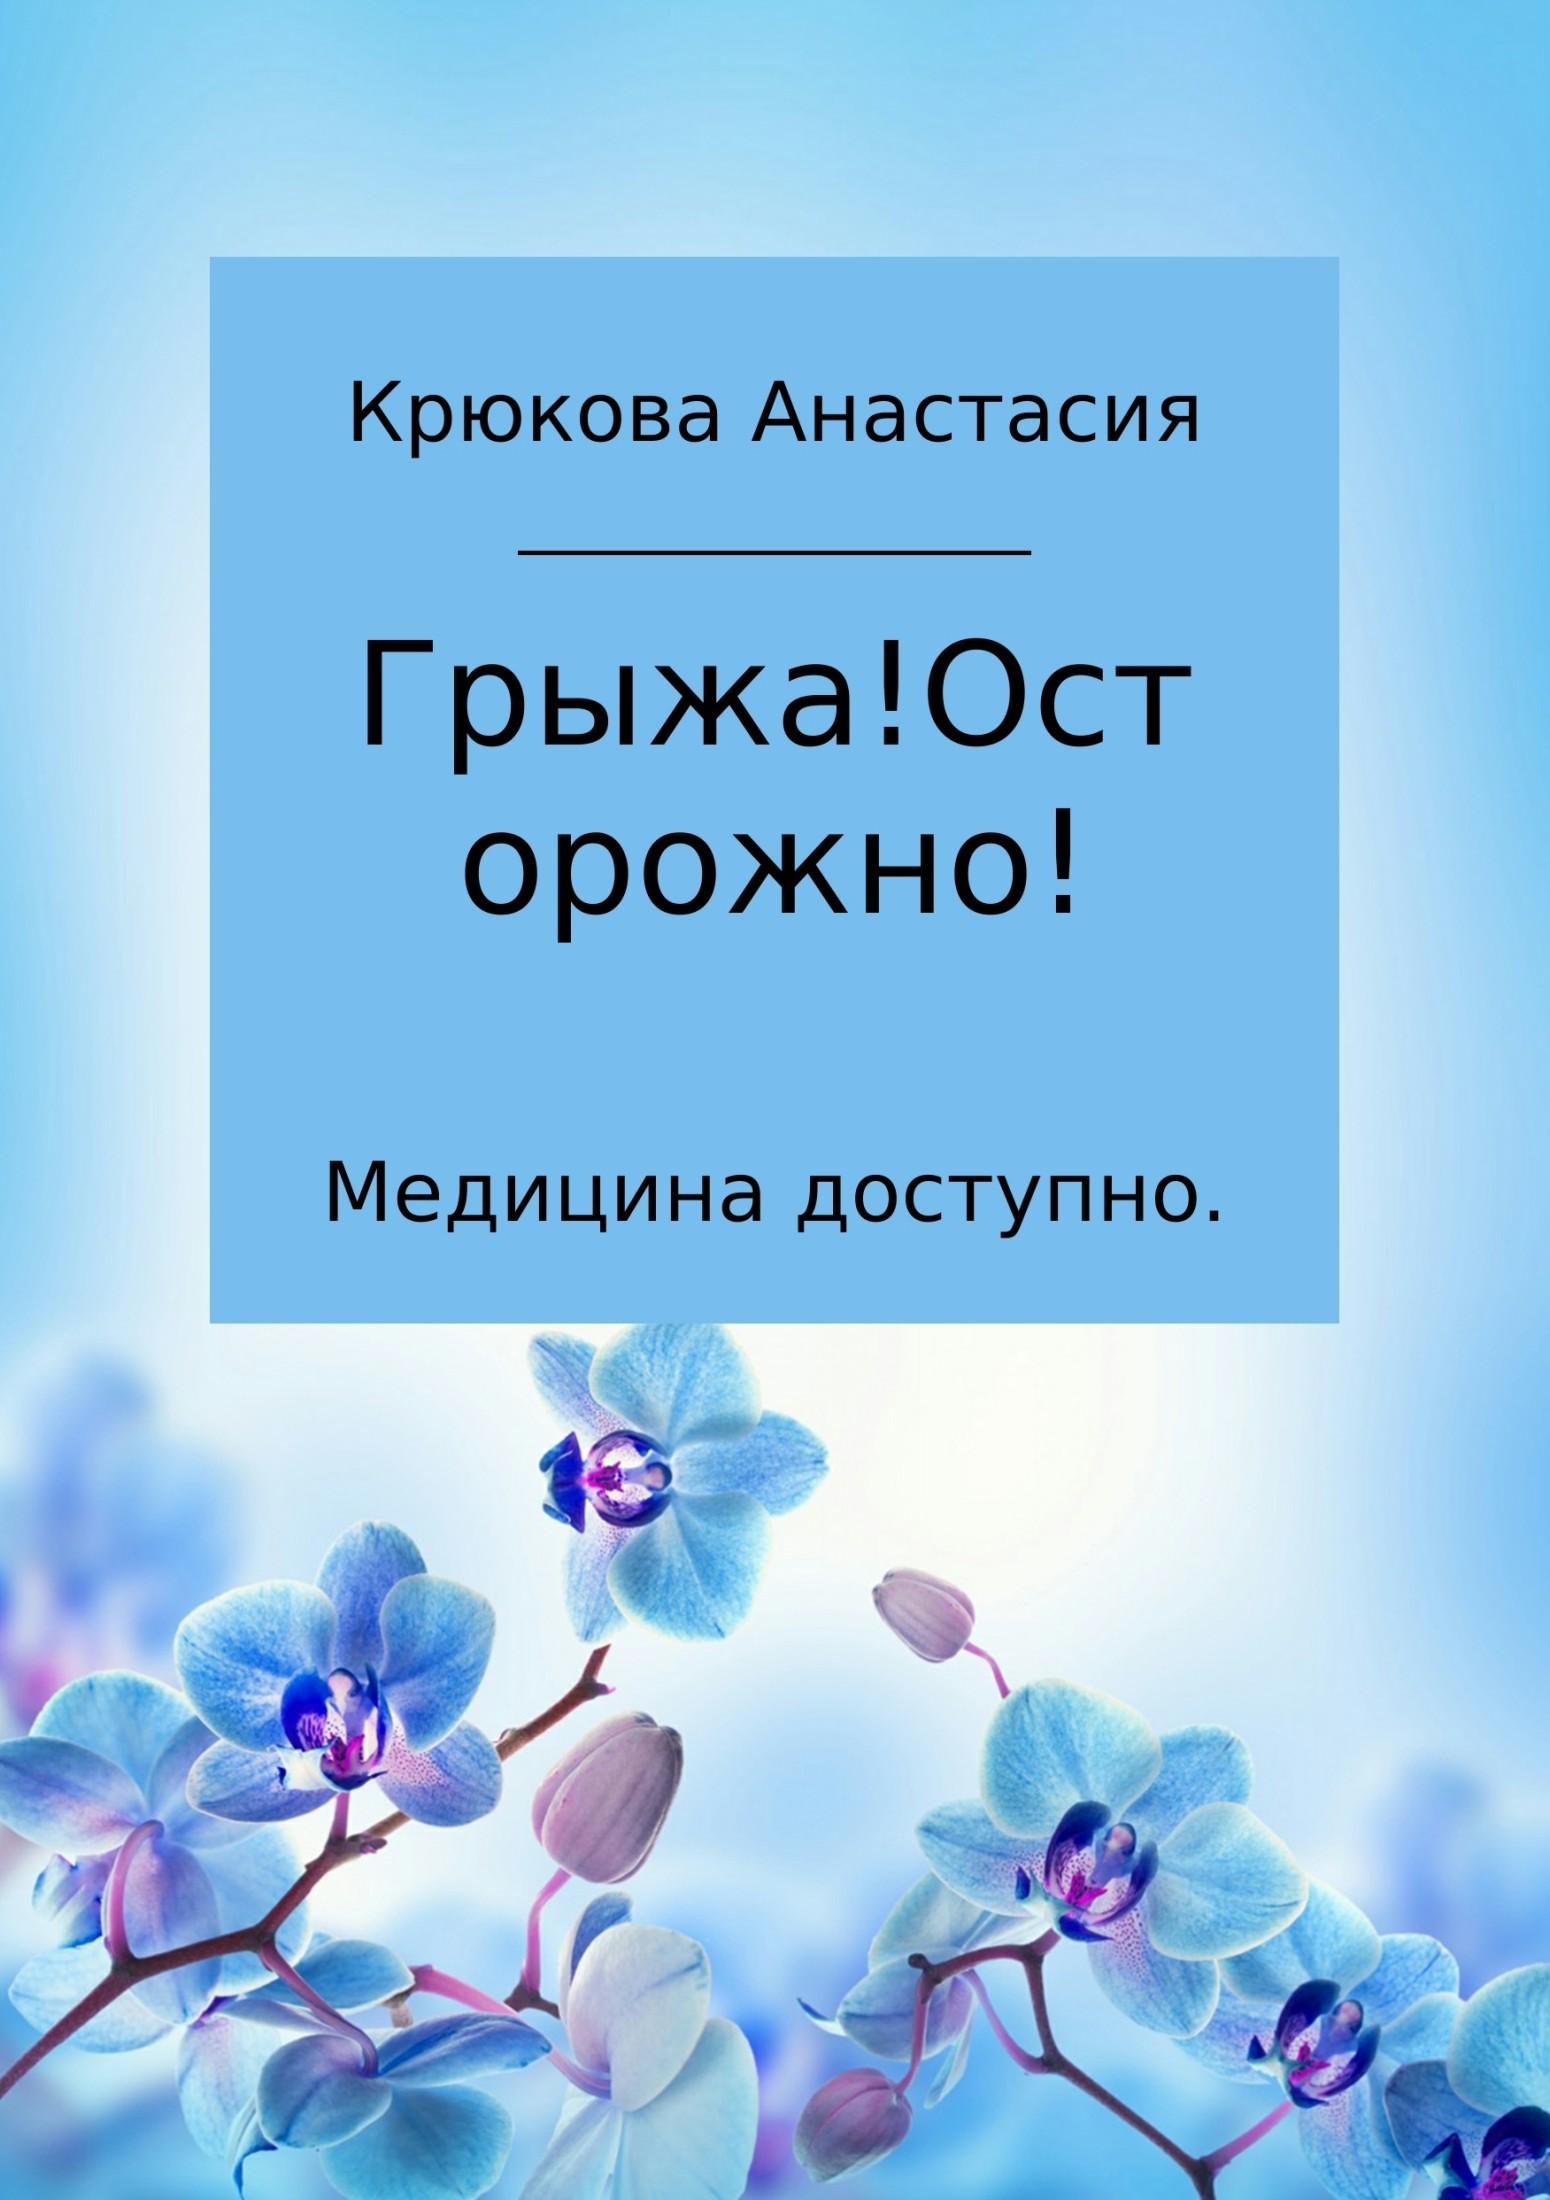 Анастасия Сергеевна Крюкова Медицина доступно. Грыжа! Осторожно!